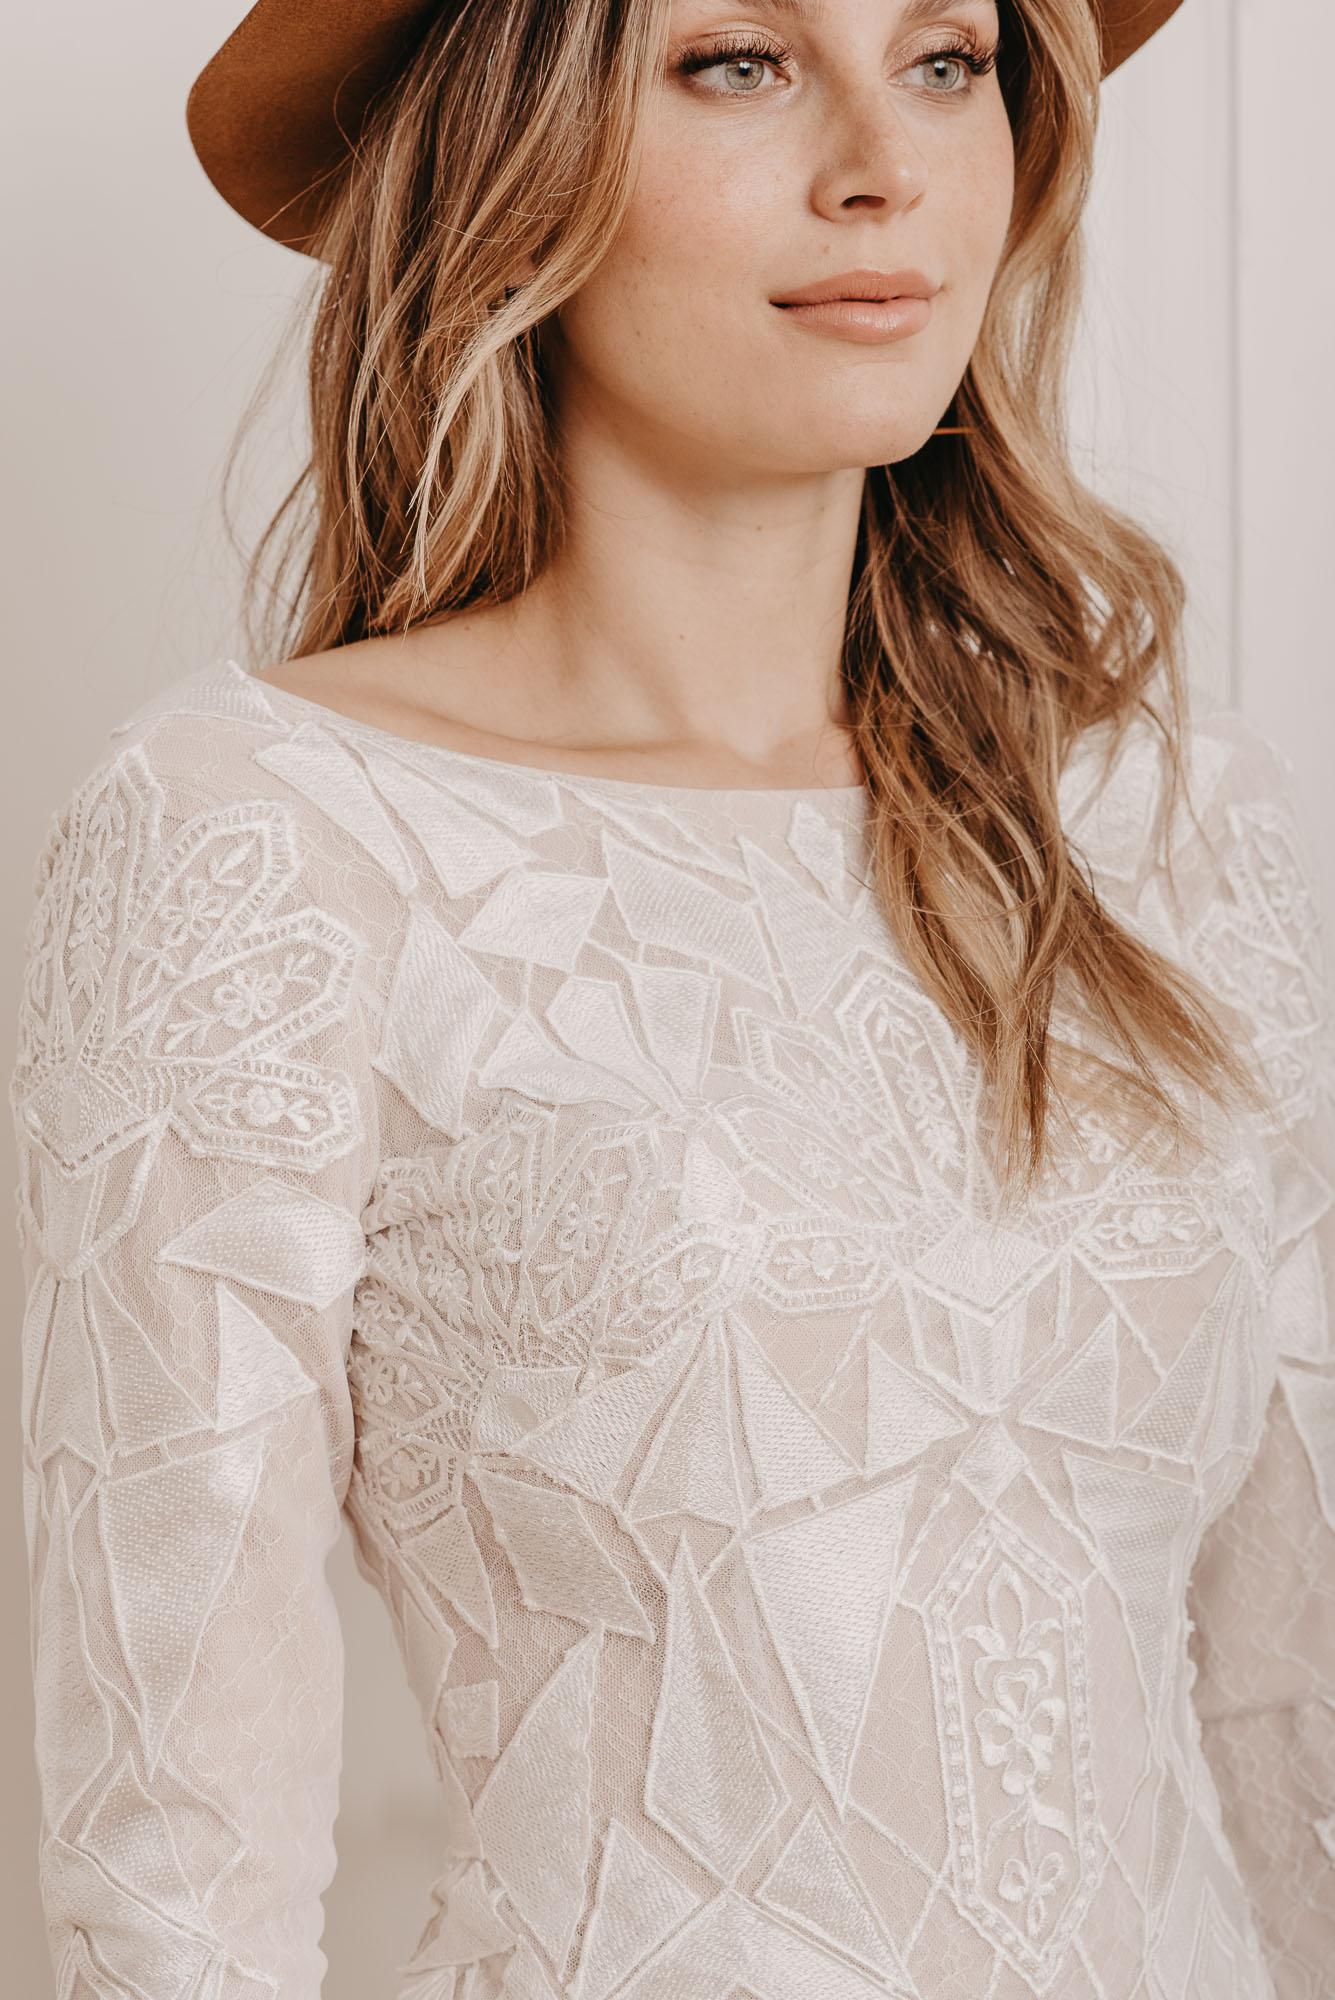 Aloe Brautkleid - Brautmode von Oonce